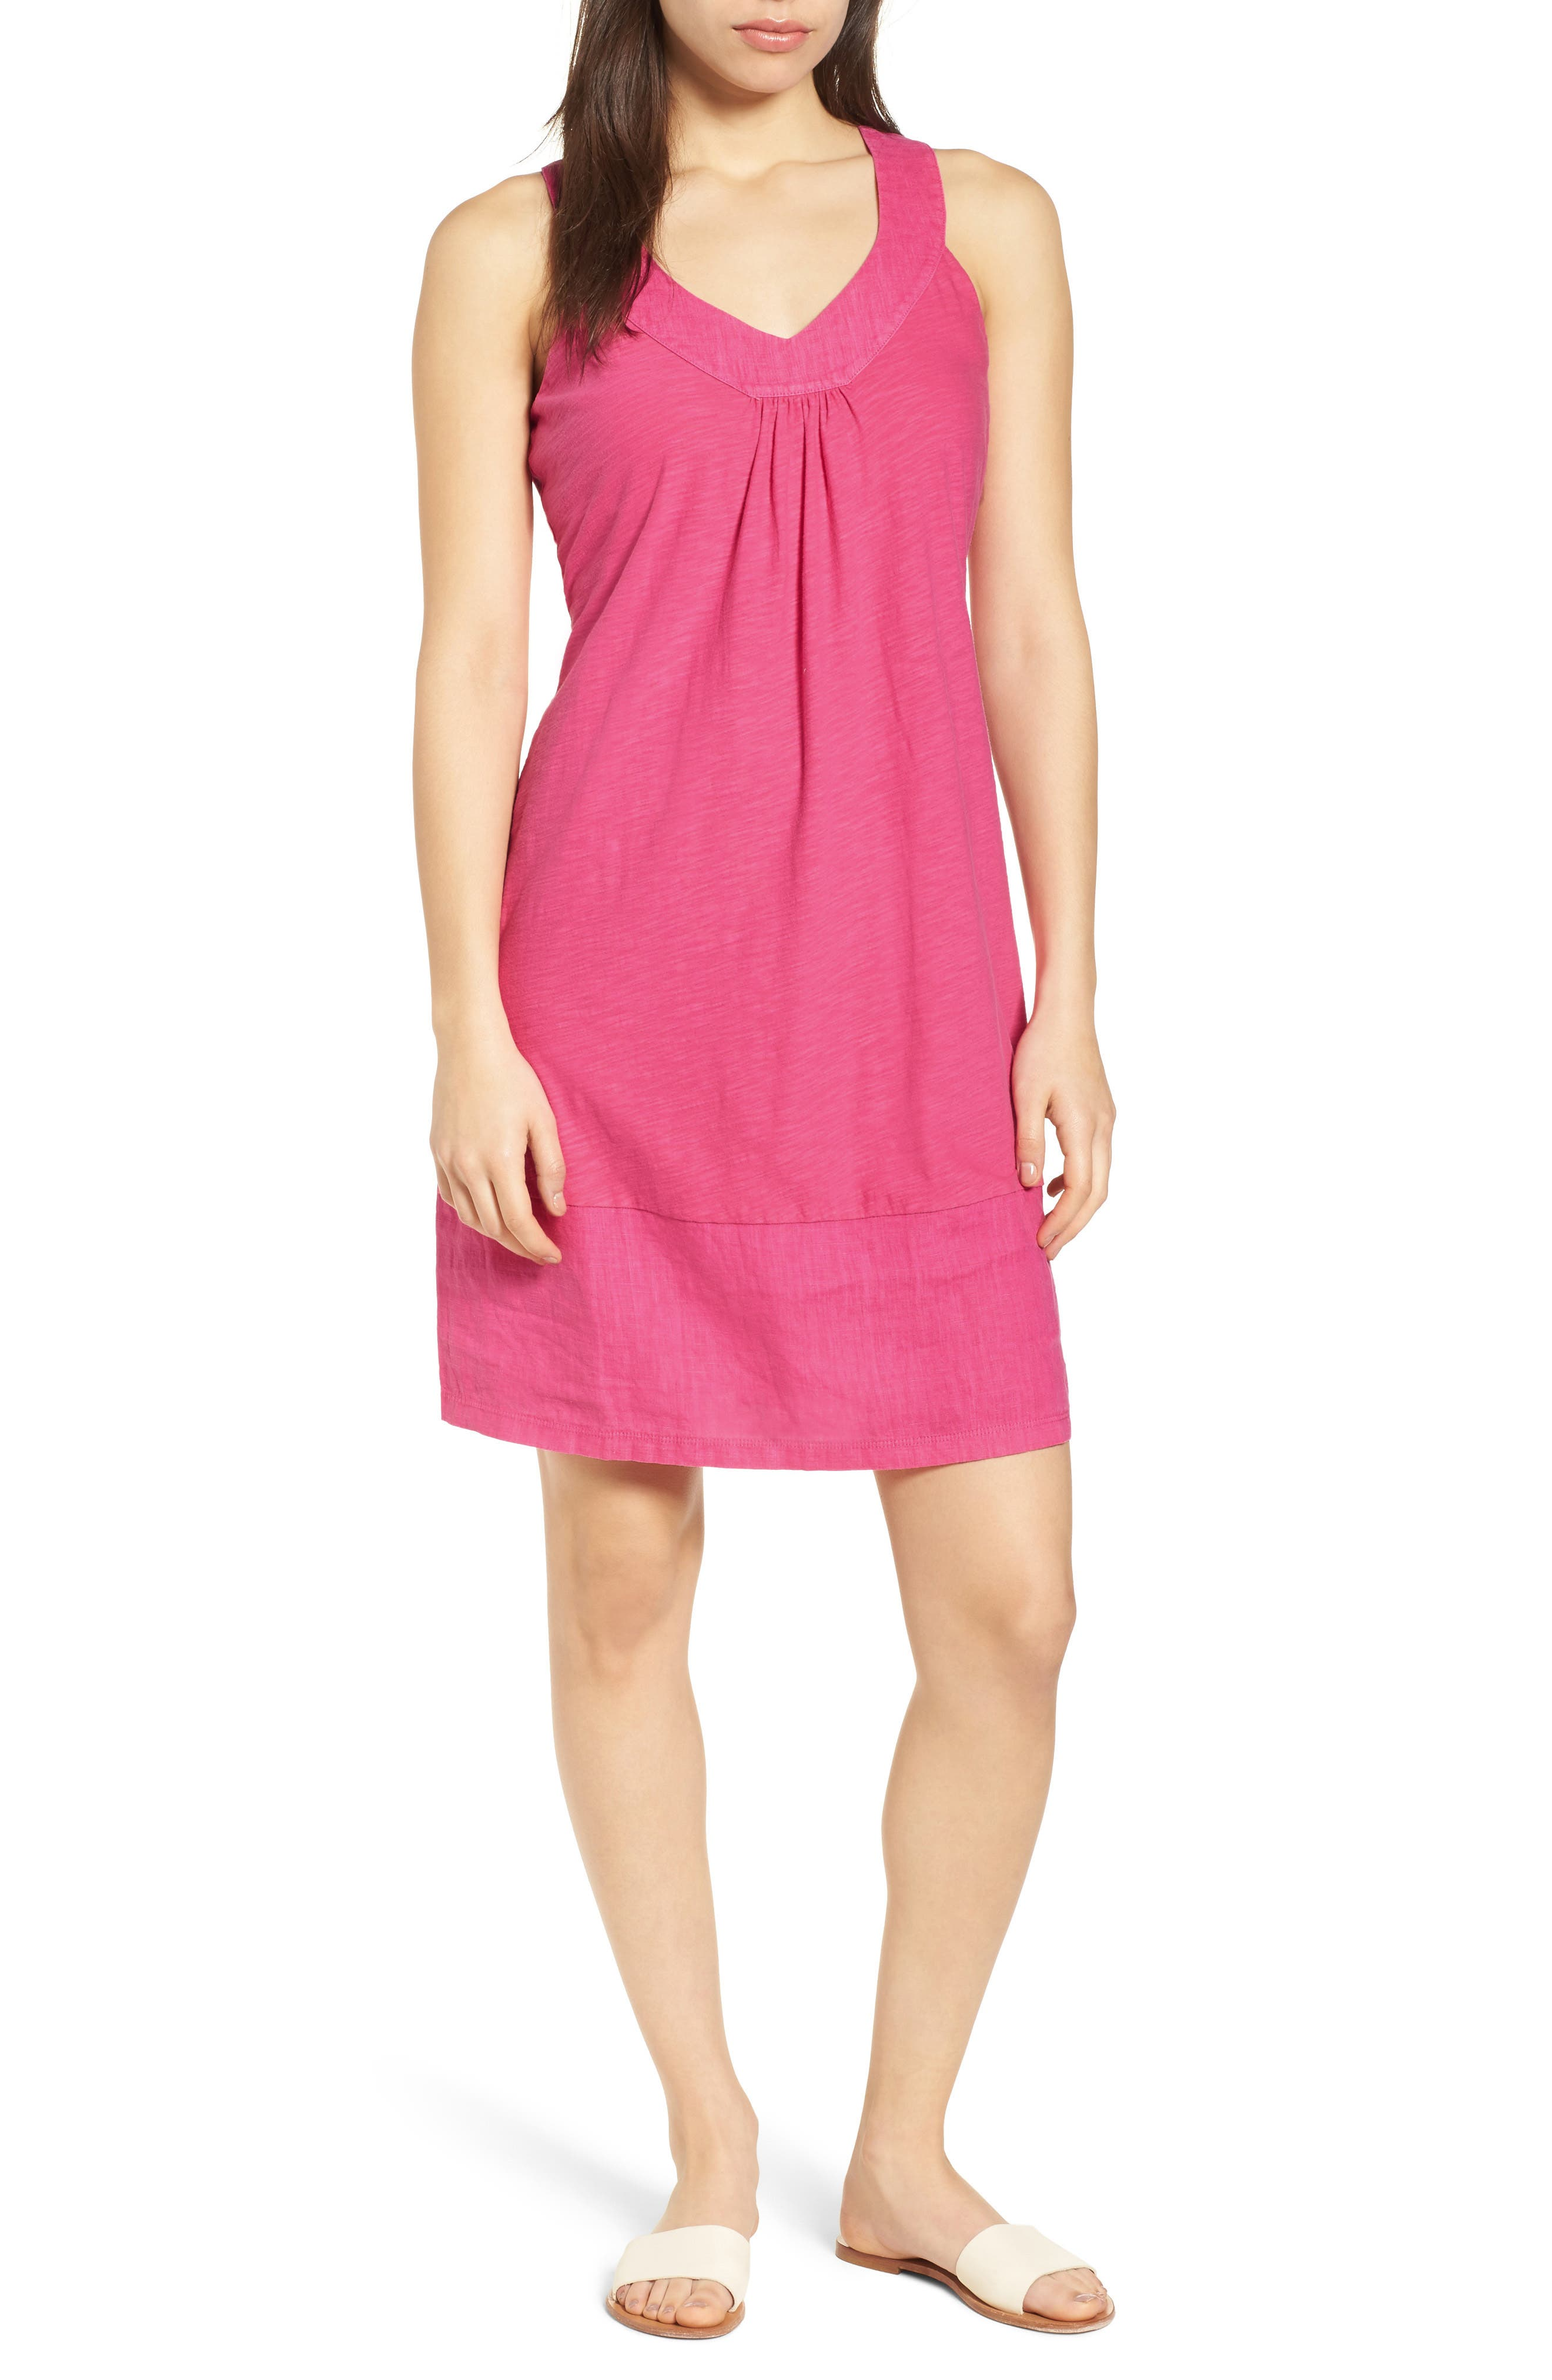 Arden Shift Dress,                         Main,                         color, Bright Blush